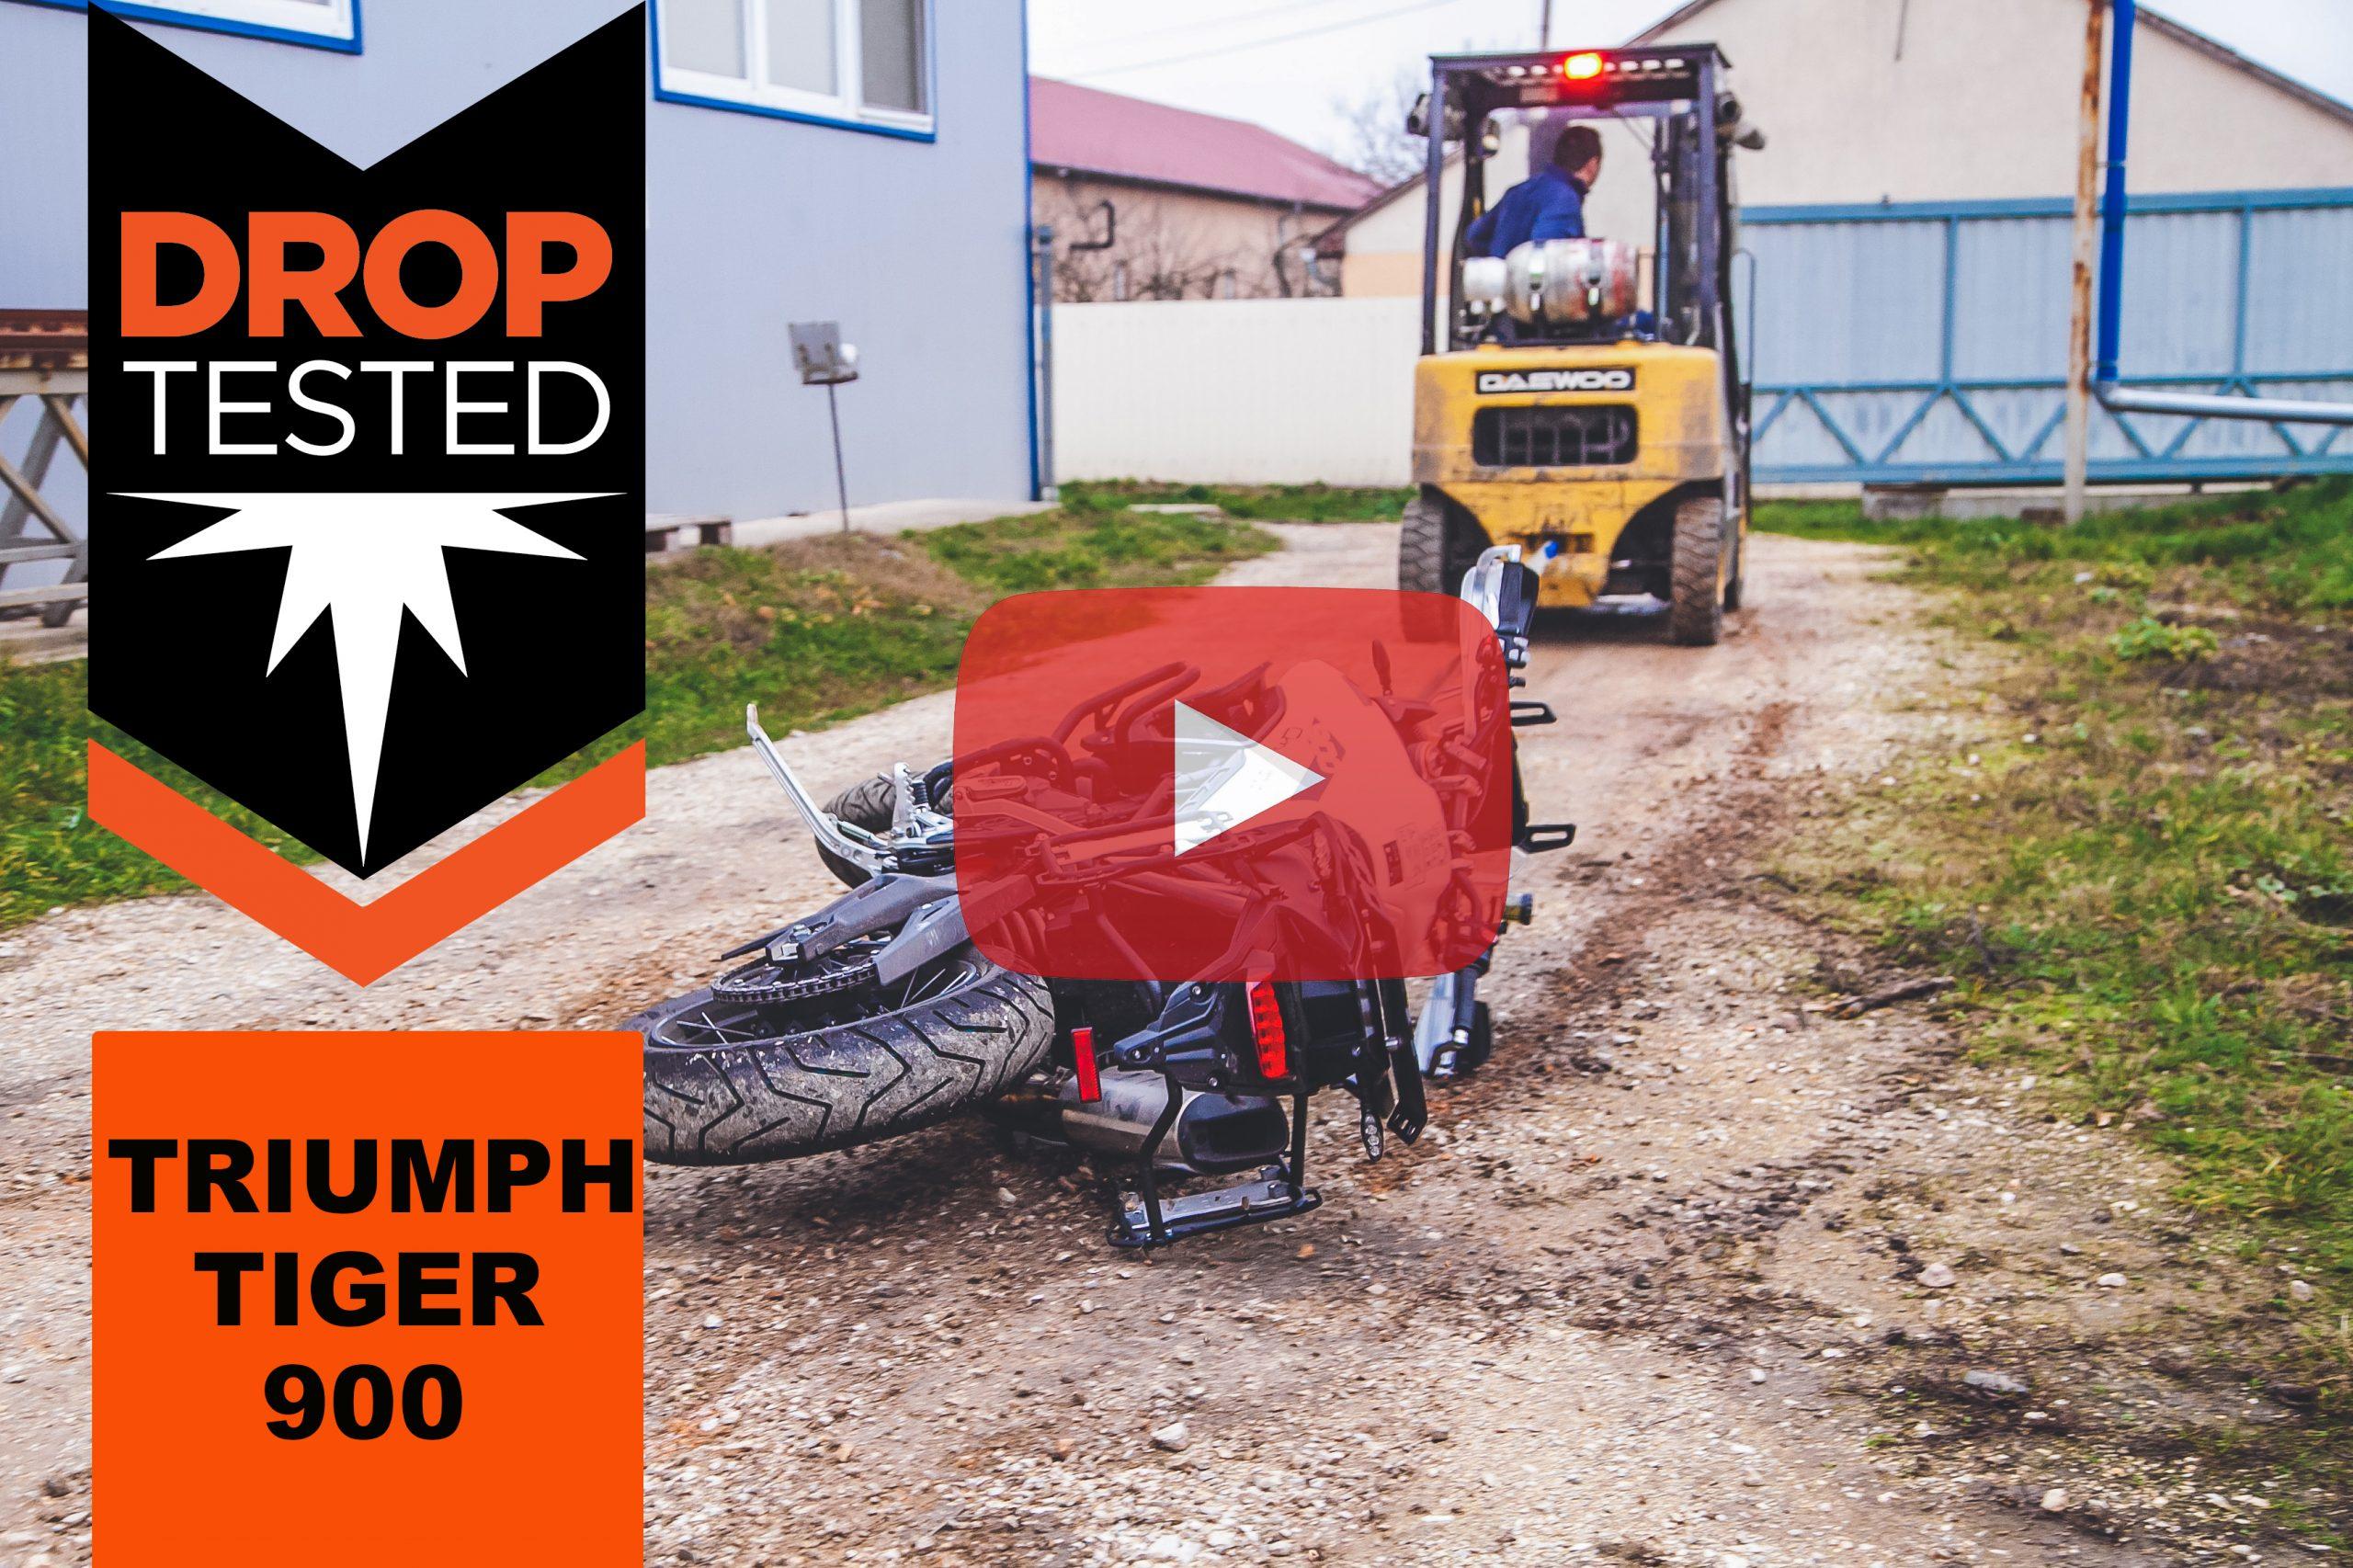 Triumph Tiger 900 Torture Tested Crash Bars